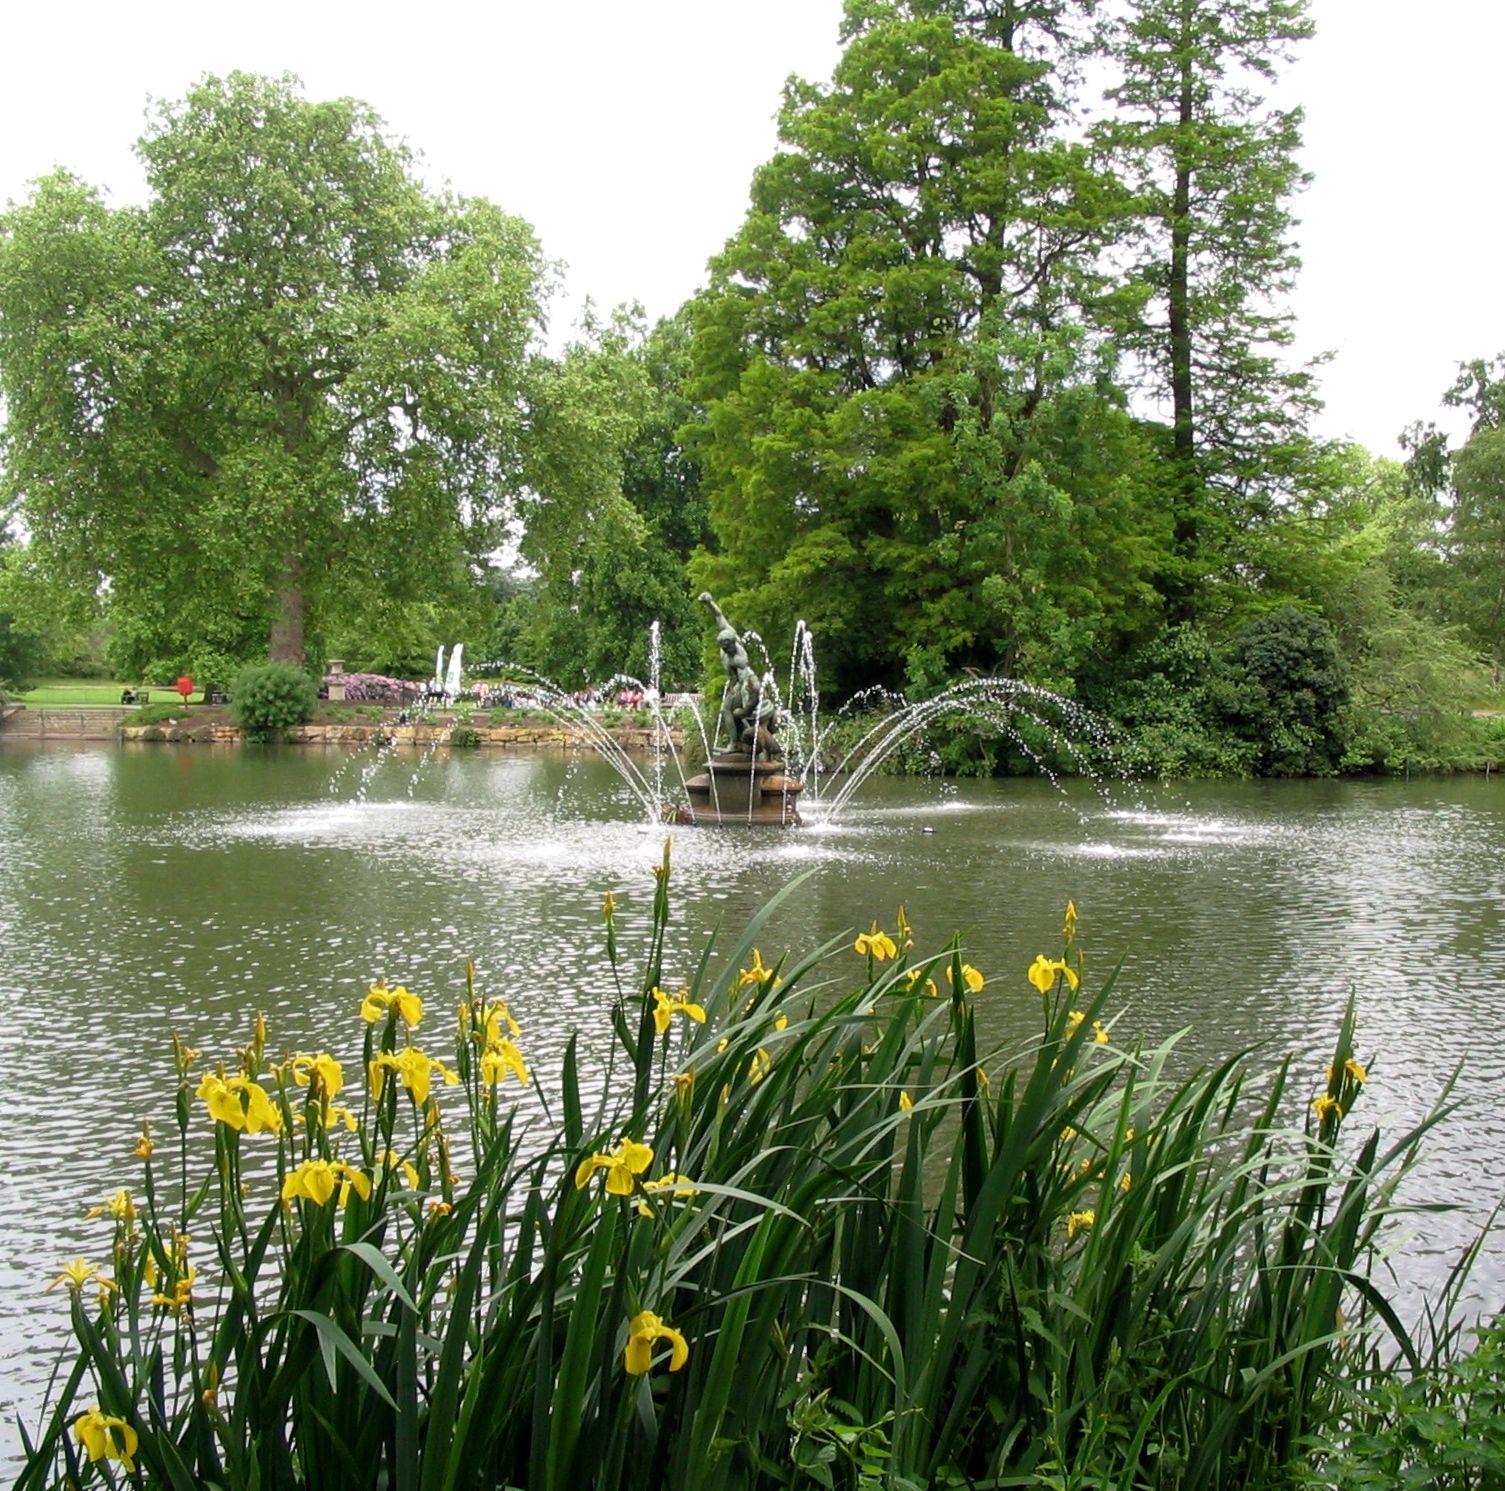 5ca6df06c519709d5bb4a10c8c7fa612 - Getting To Kew Gardens By River